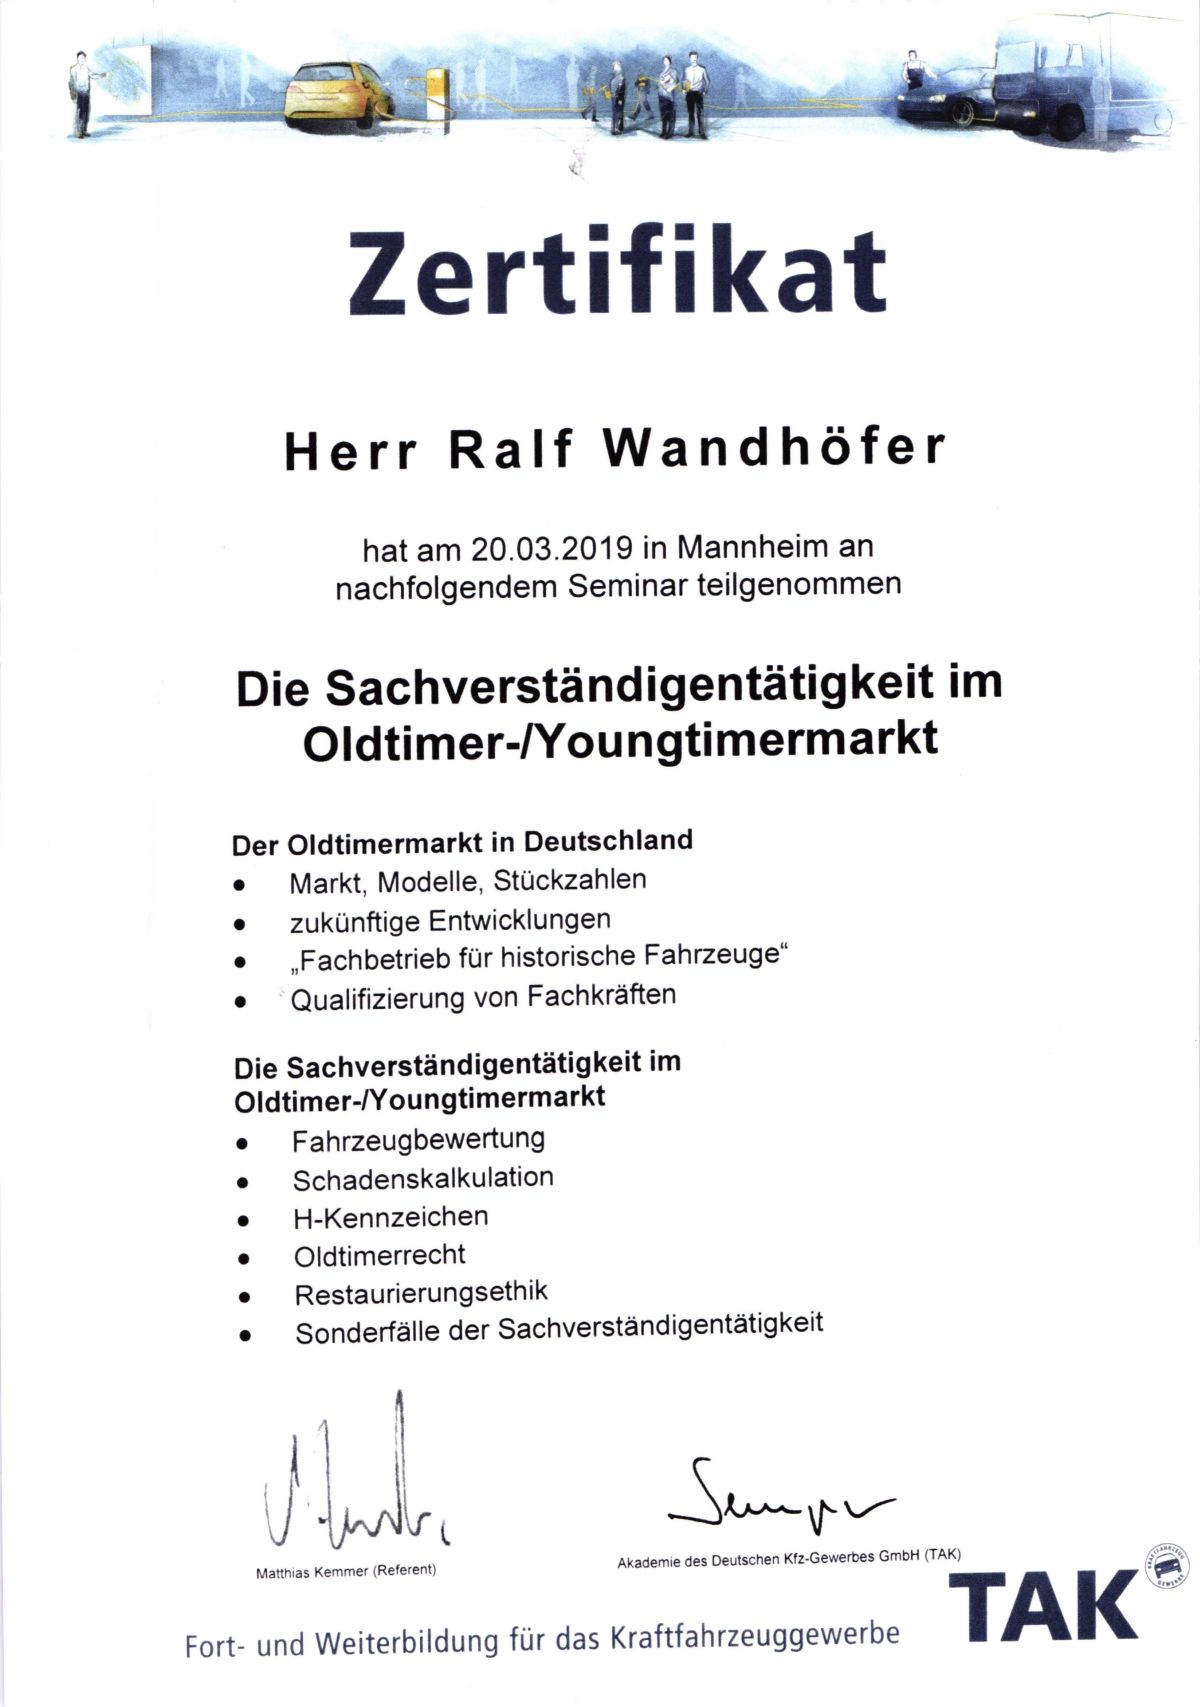 Ralf_Wandhöfer_Zertifikat_011